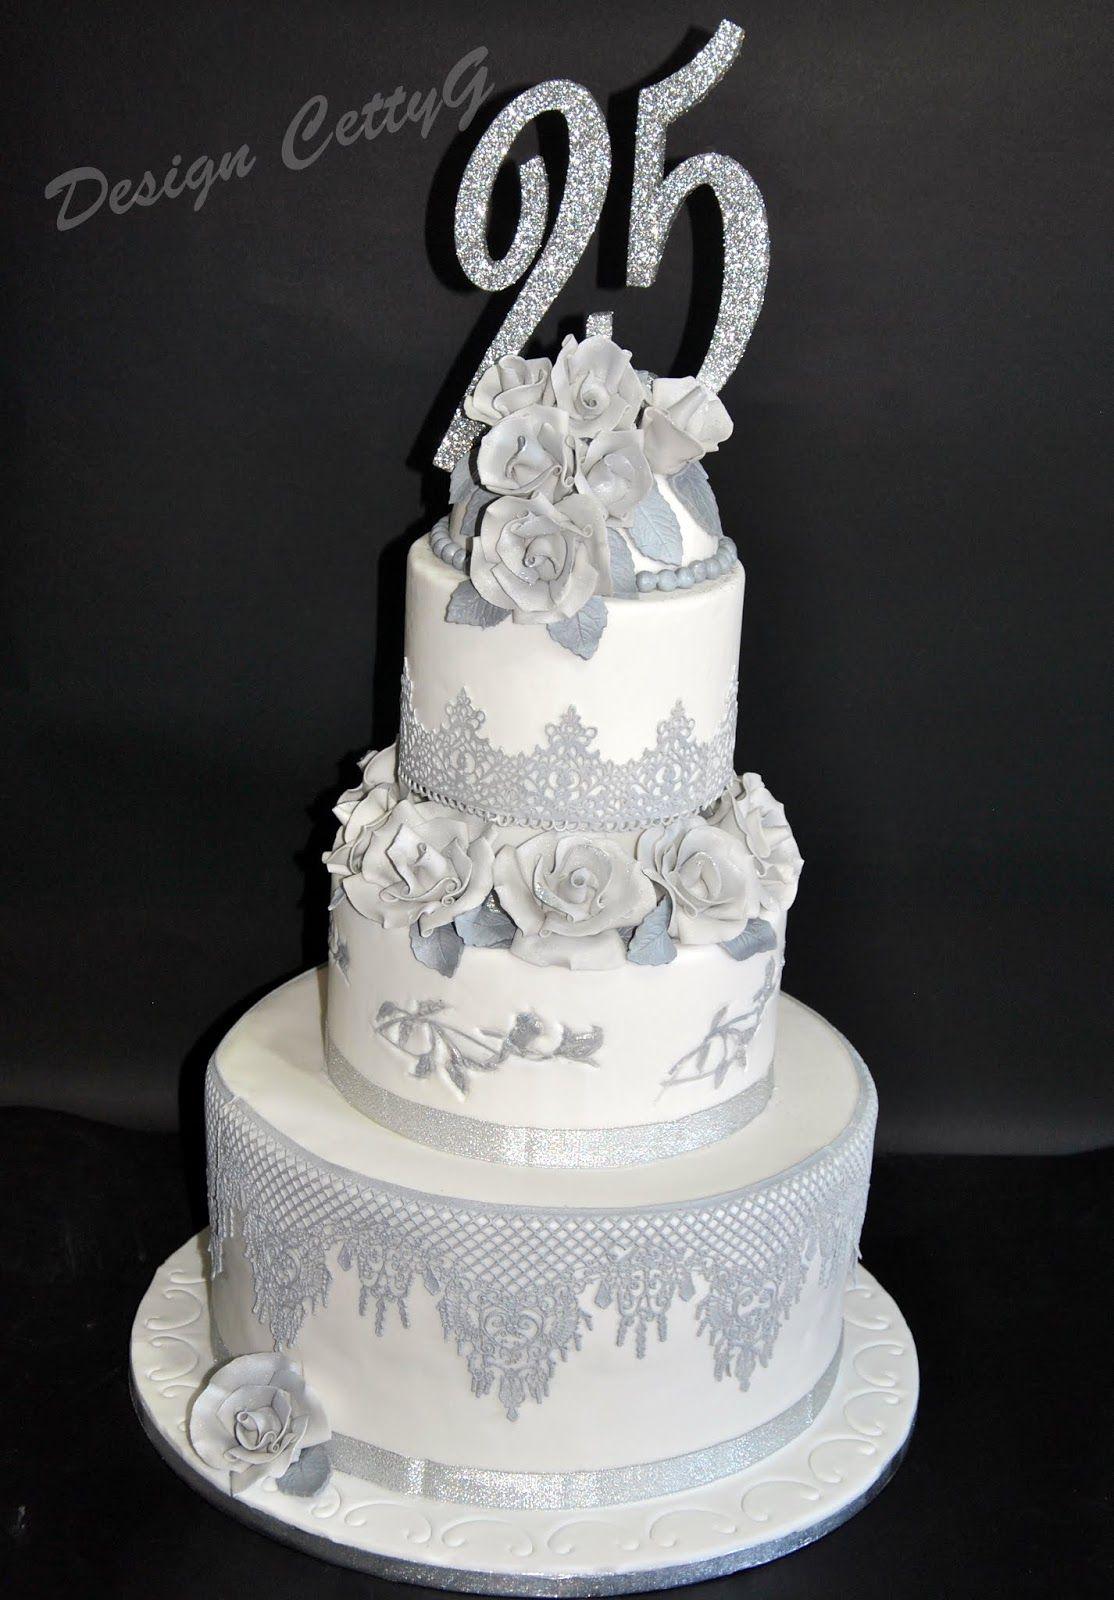 Favori Le torte decorate di CettyG: Wedding cake 25° in pdz. | cake  OM16